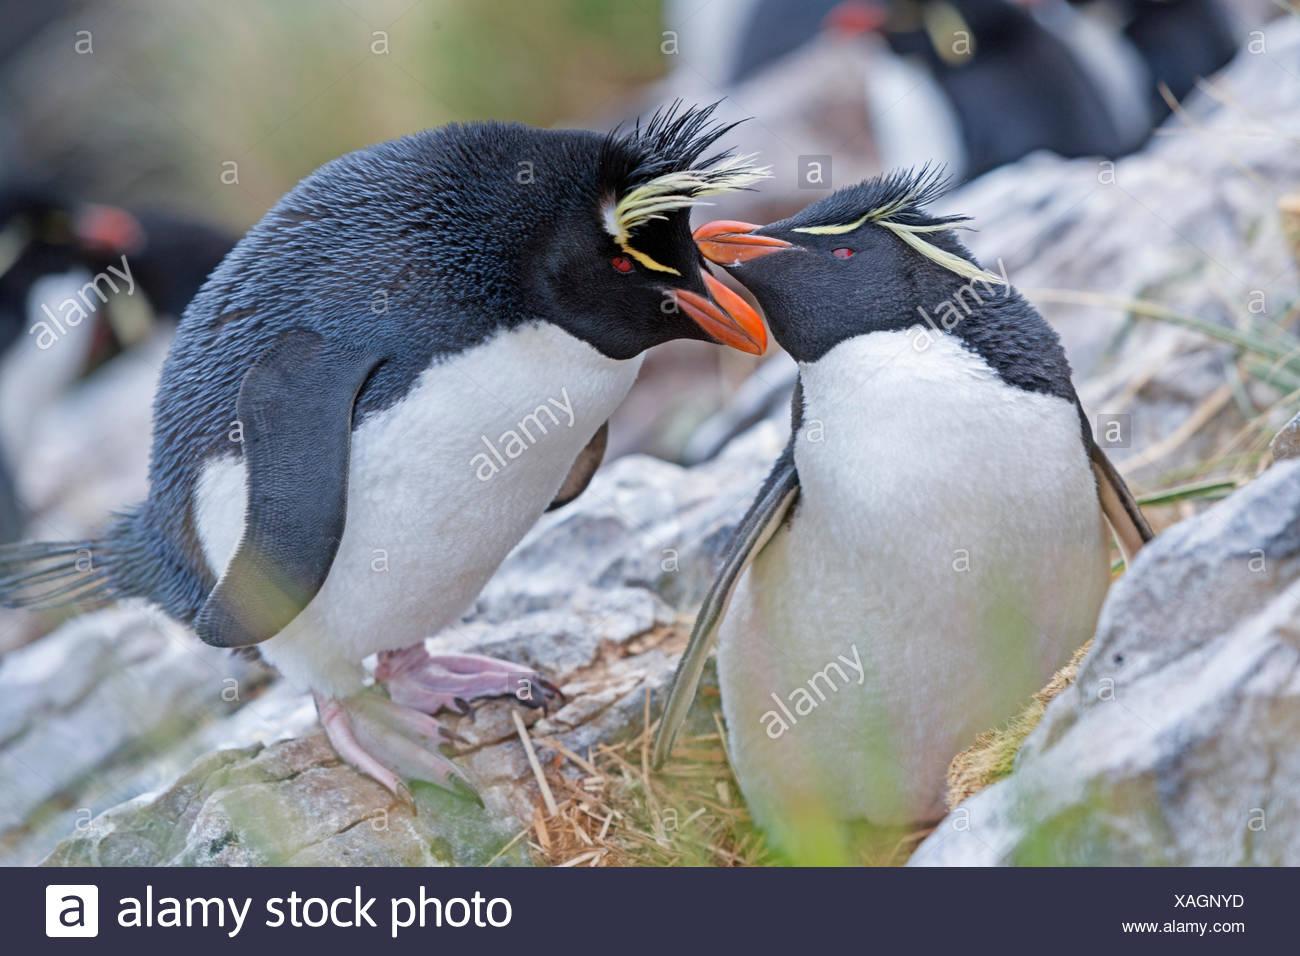 Rockhopper penguins (Eudyptes chrysocome), Falkland Islands, South Atlantic - Stock Image